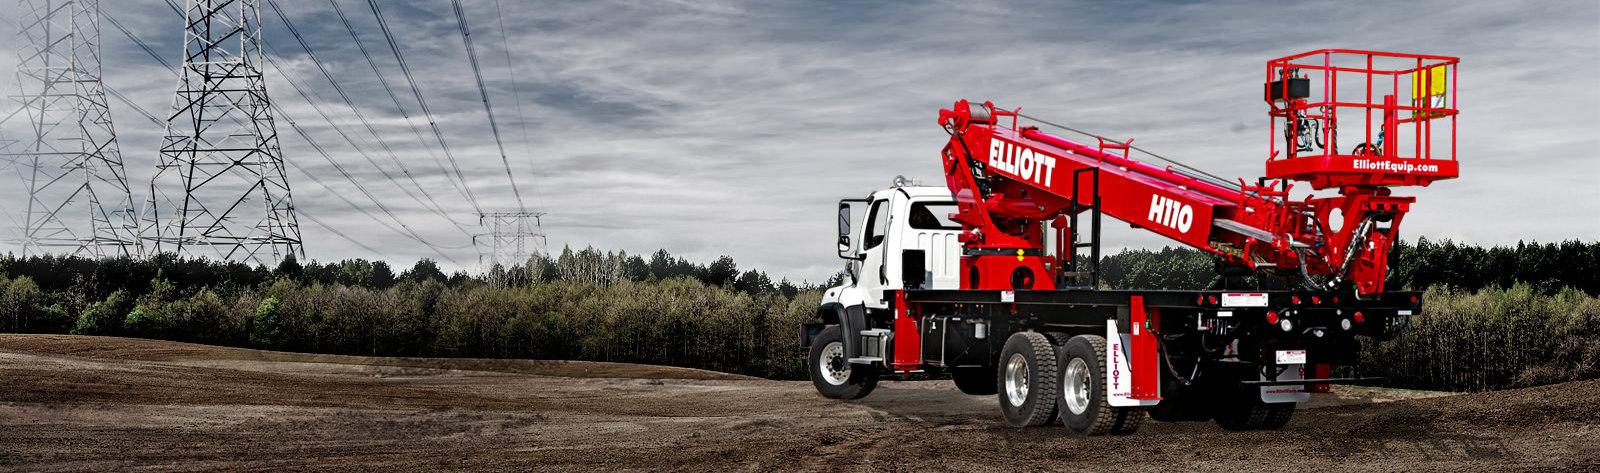 elliott-aerial-lift.jpg